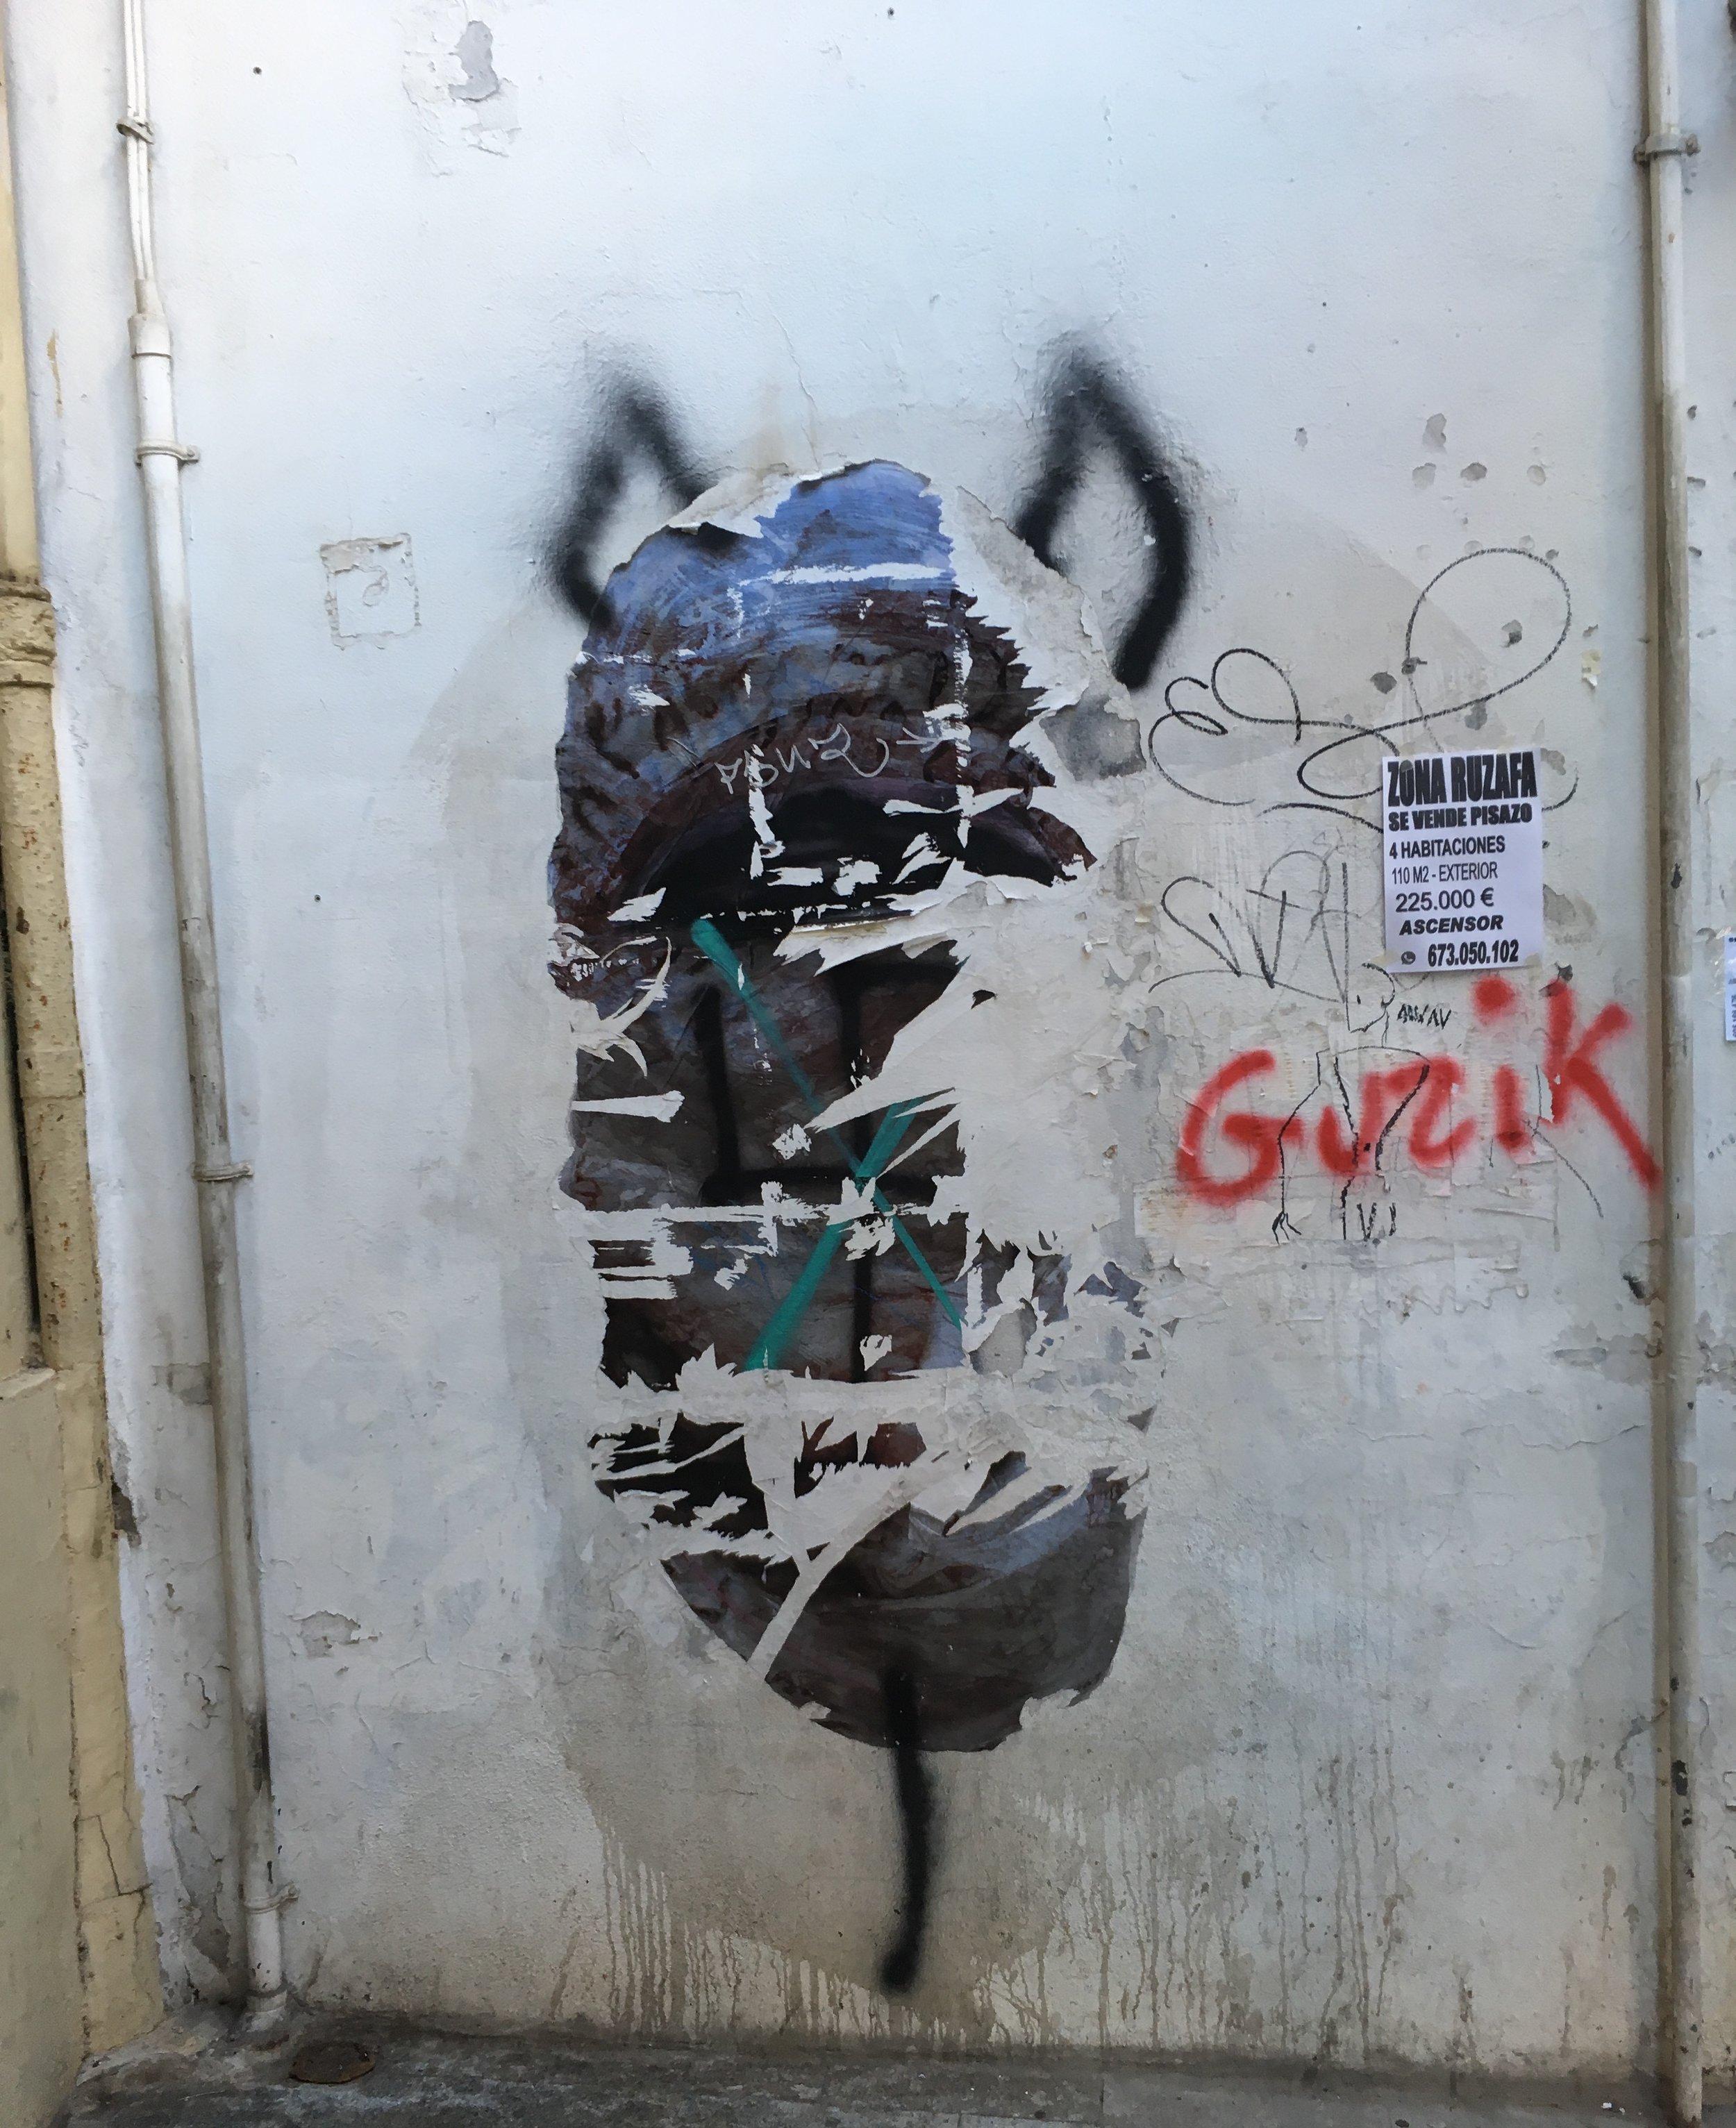 street-art-culture.JPG